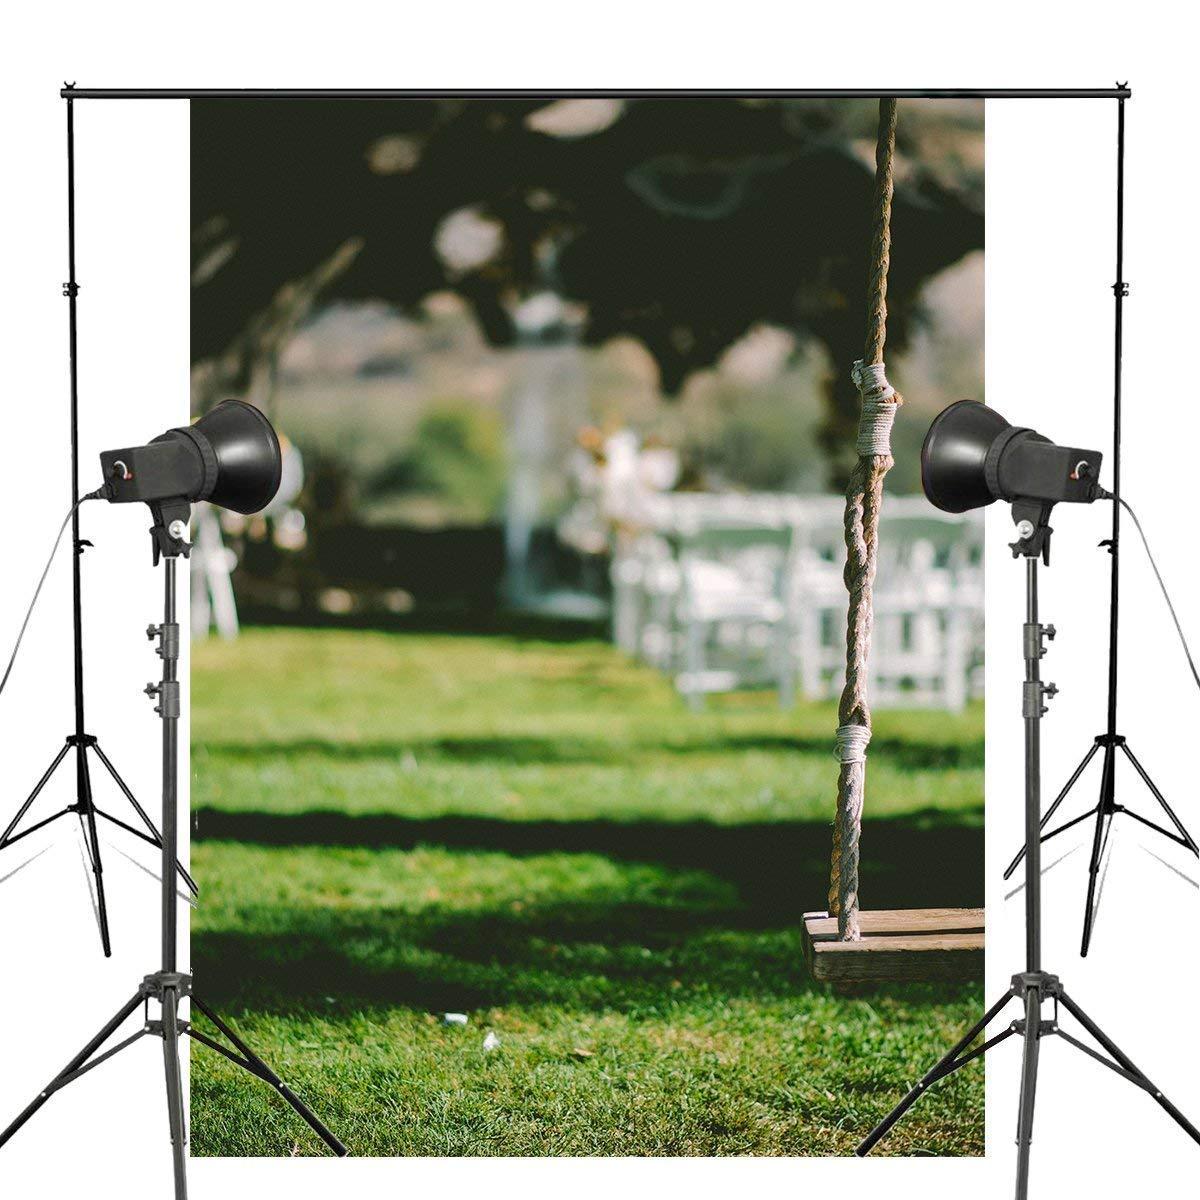 ERTIANANG 5x7ft Swing Backdrop Photography Background Wall Mural Studio Props Wall Photography Backdrop